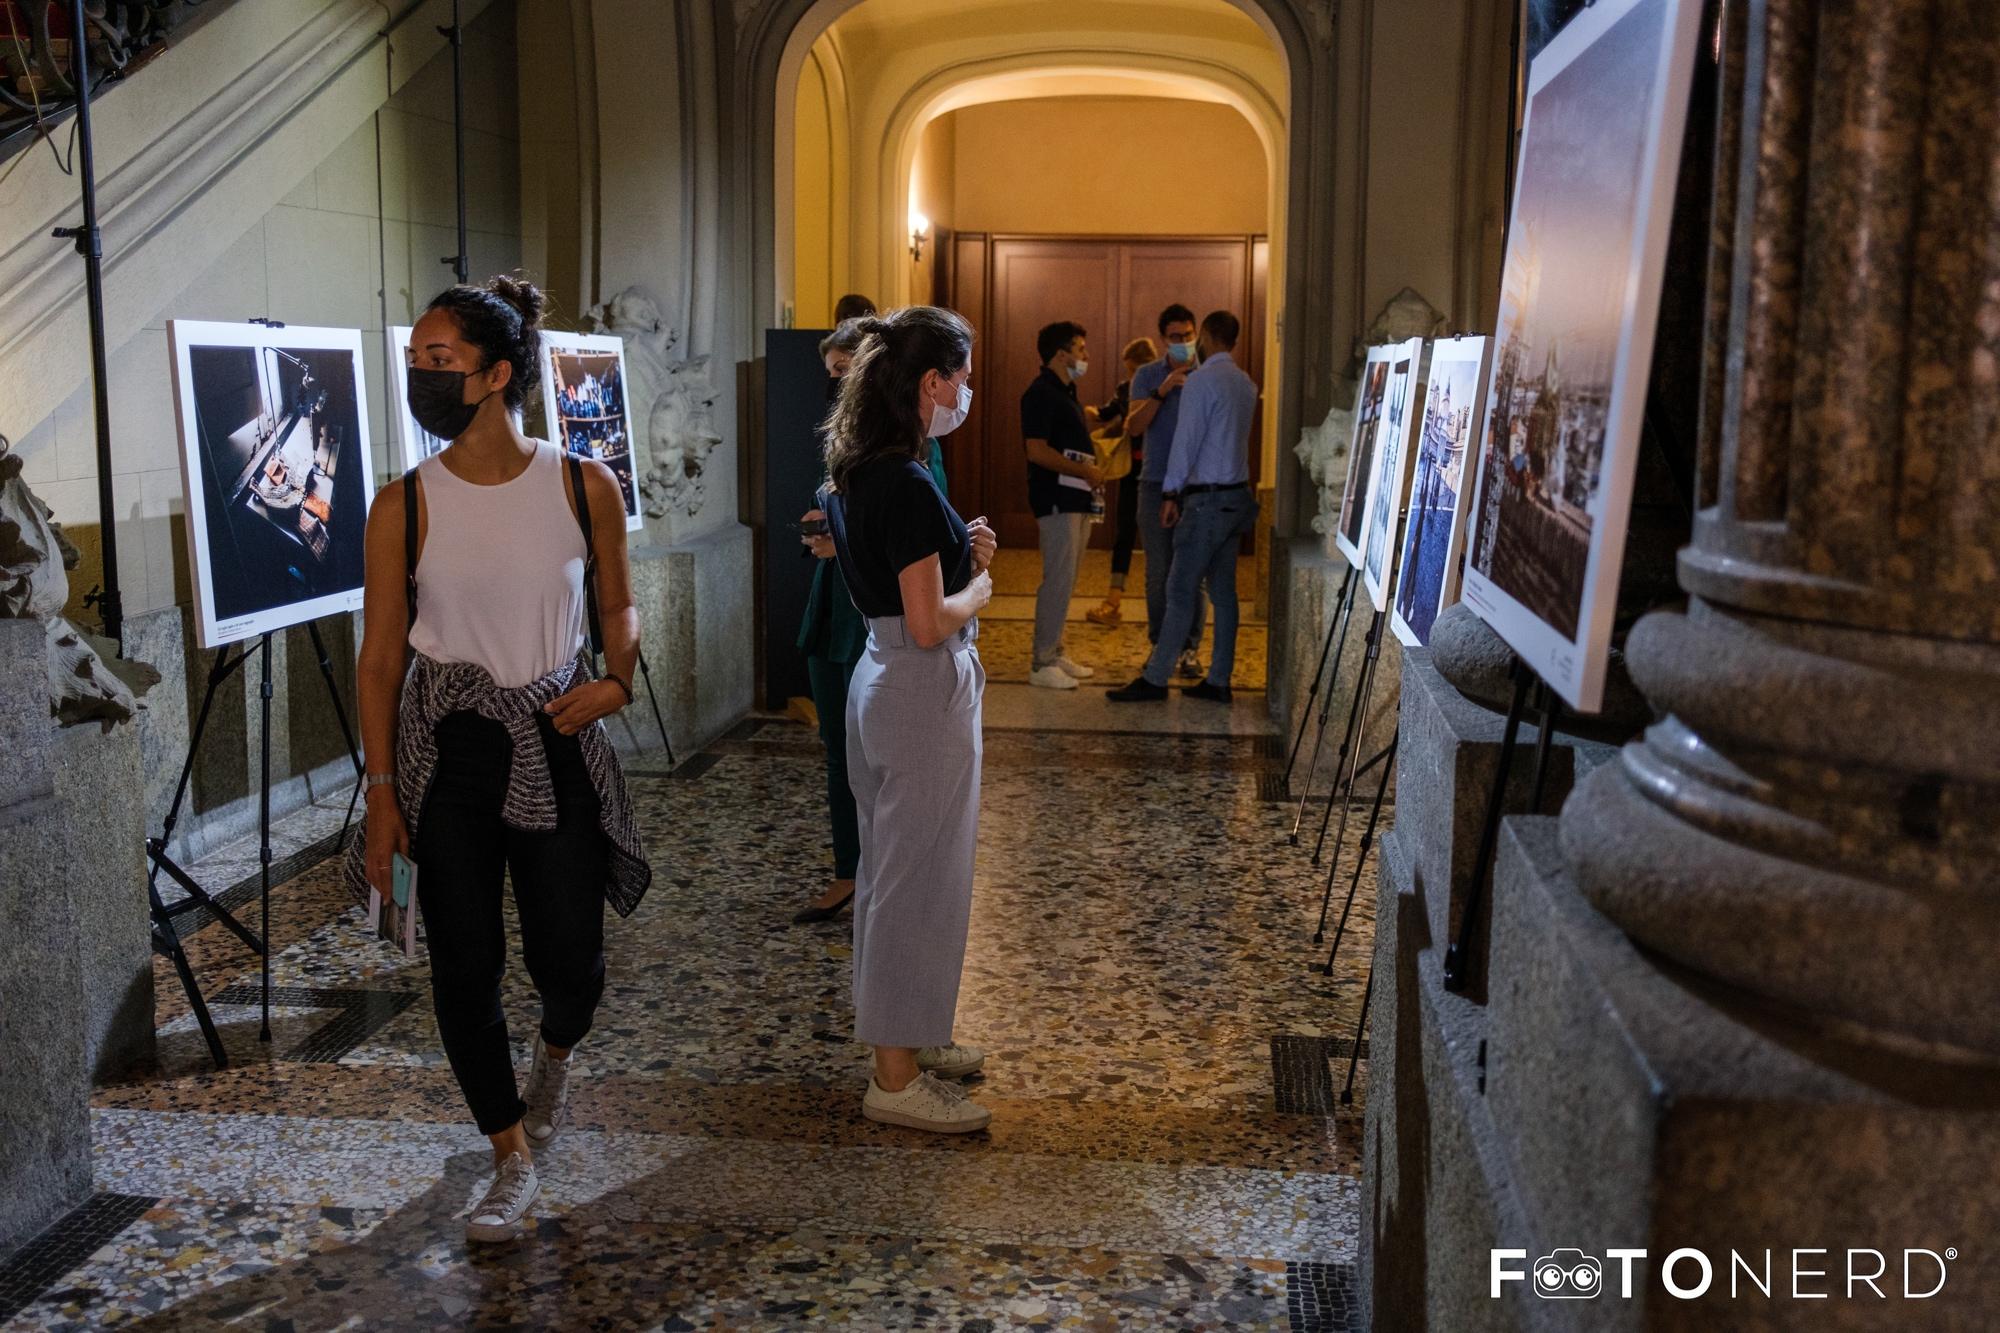 Photofestival 2021